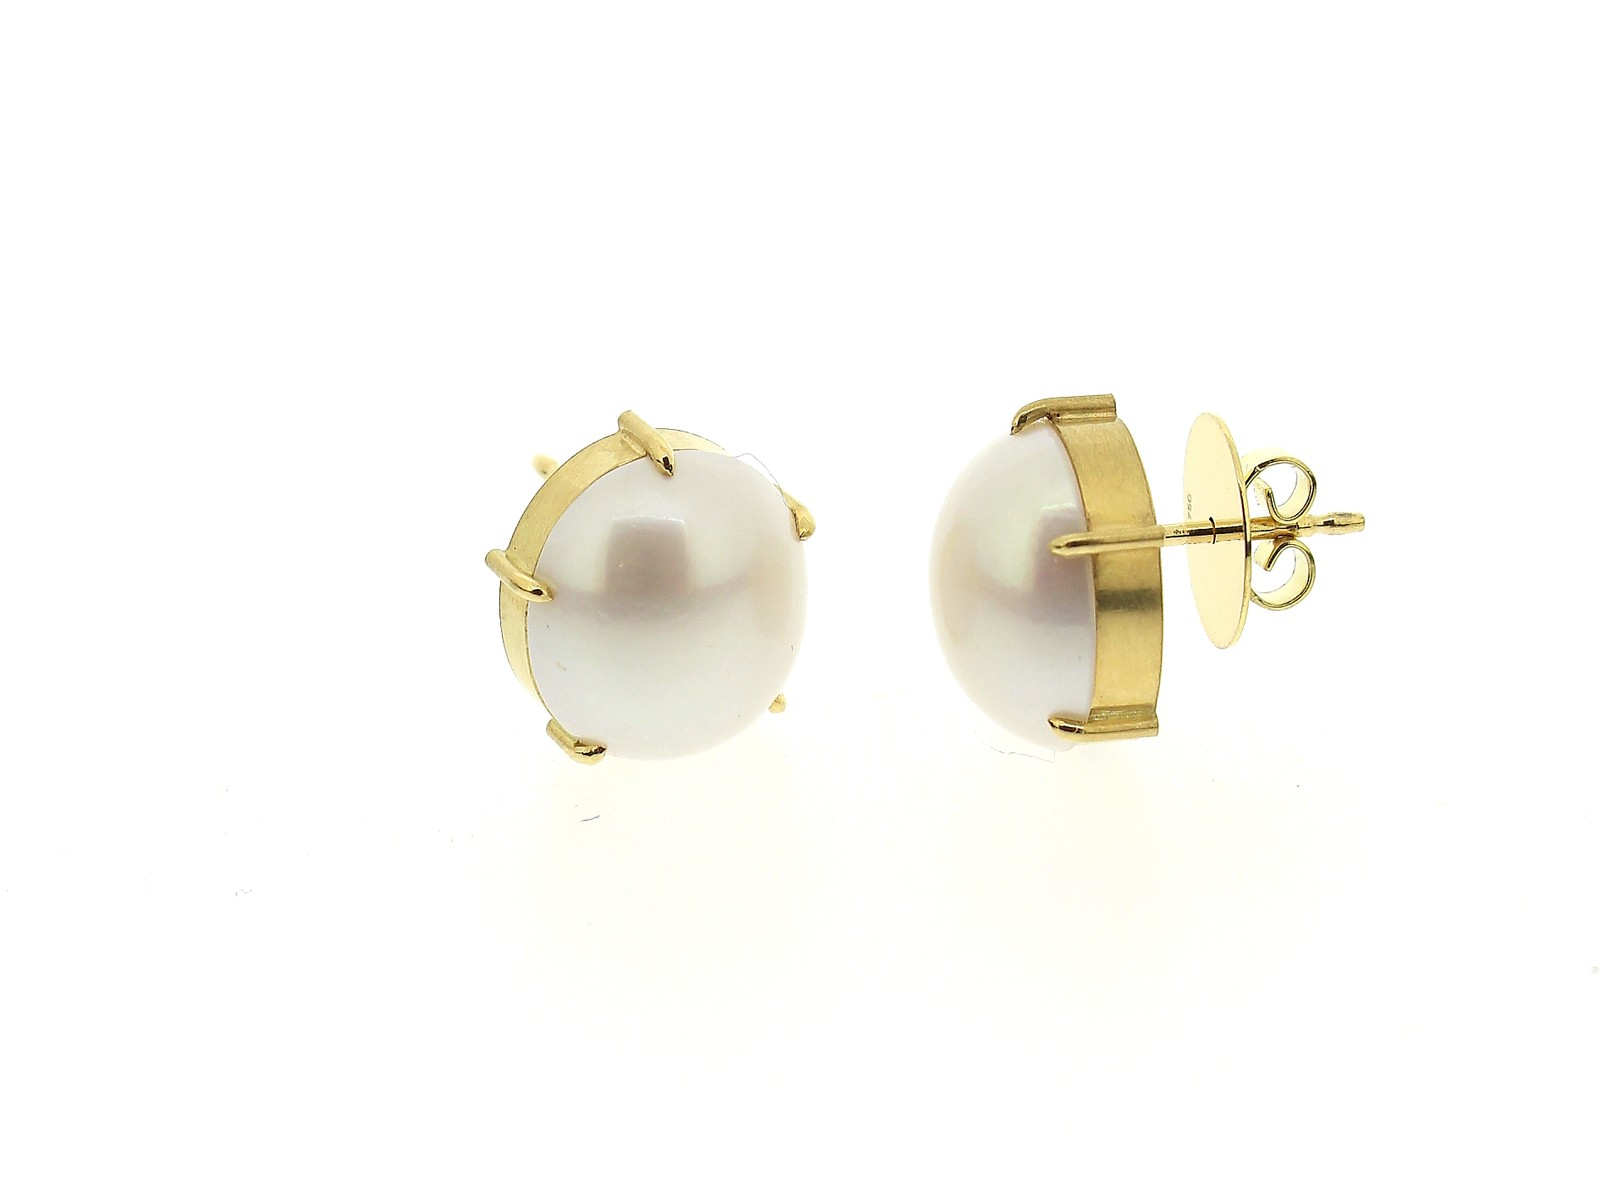 Ohrstecker Perle 18ct Gold - Köppel, Christine - 417koep09-4